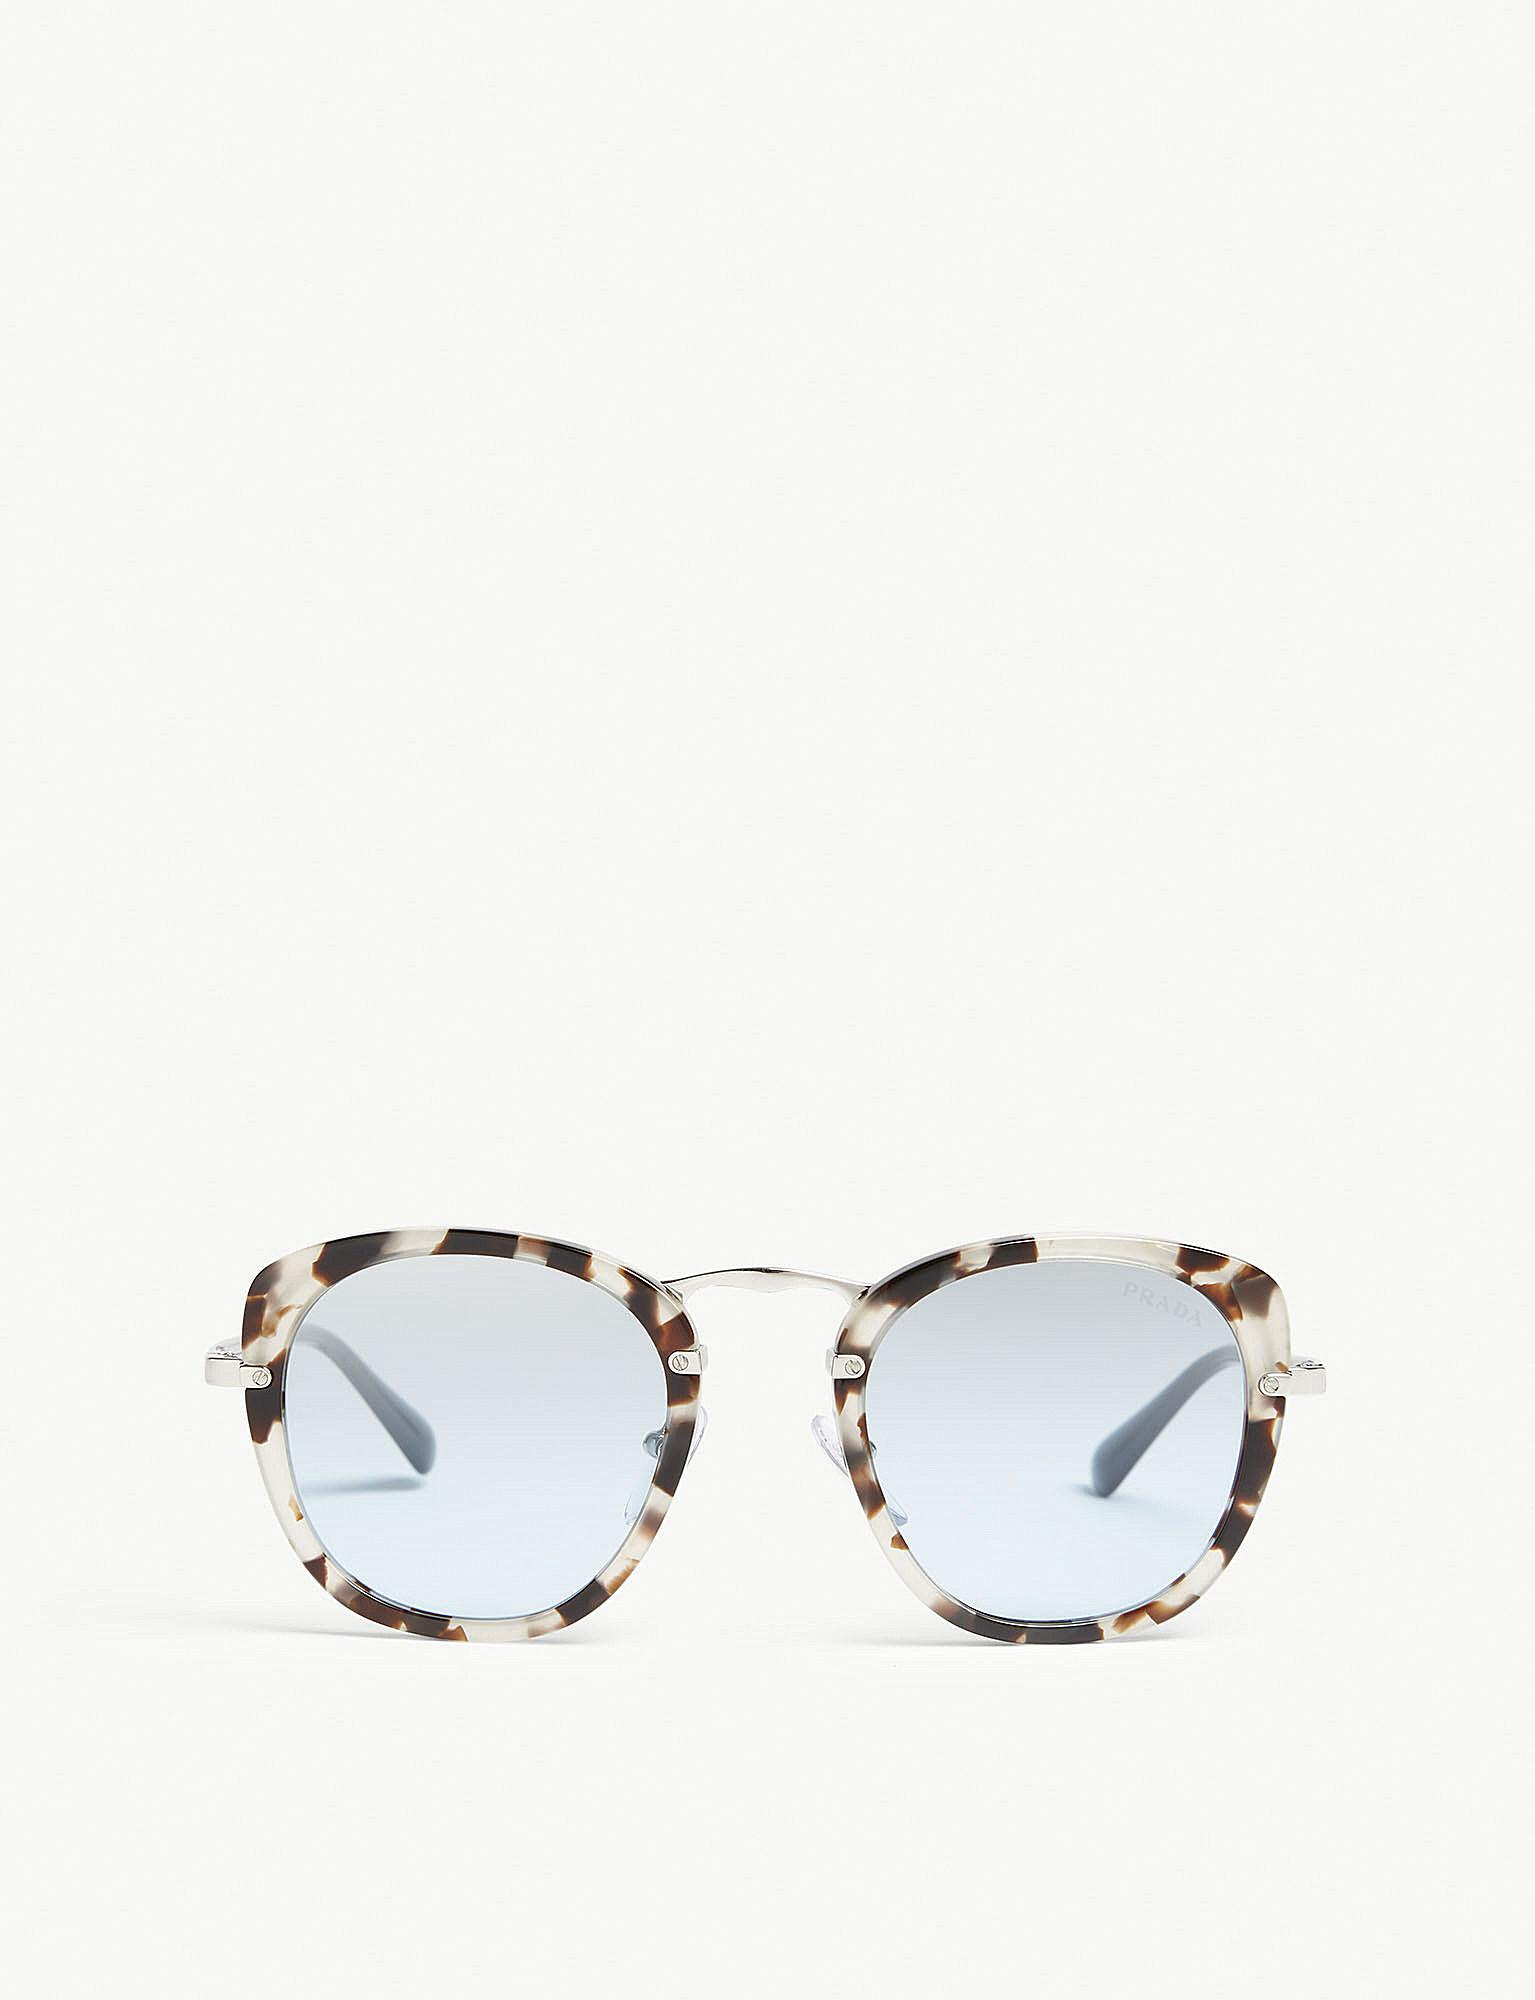 e4596bc1fb Prada Pr58us Phantos Square-frame Sunglasses in Brown - Lyst